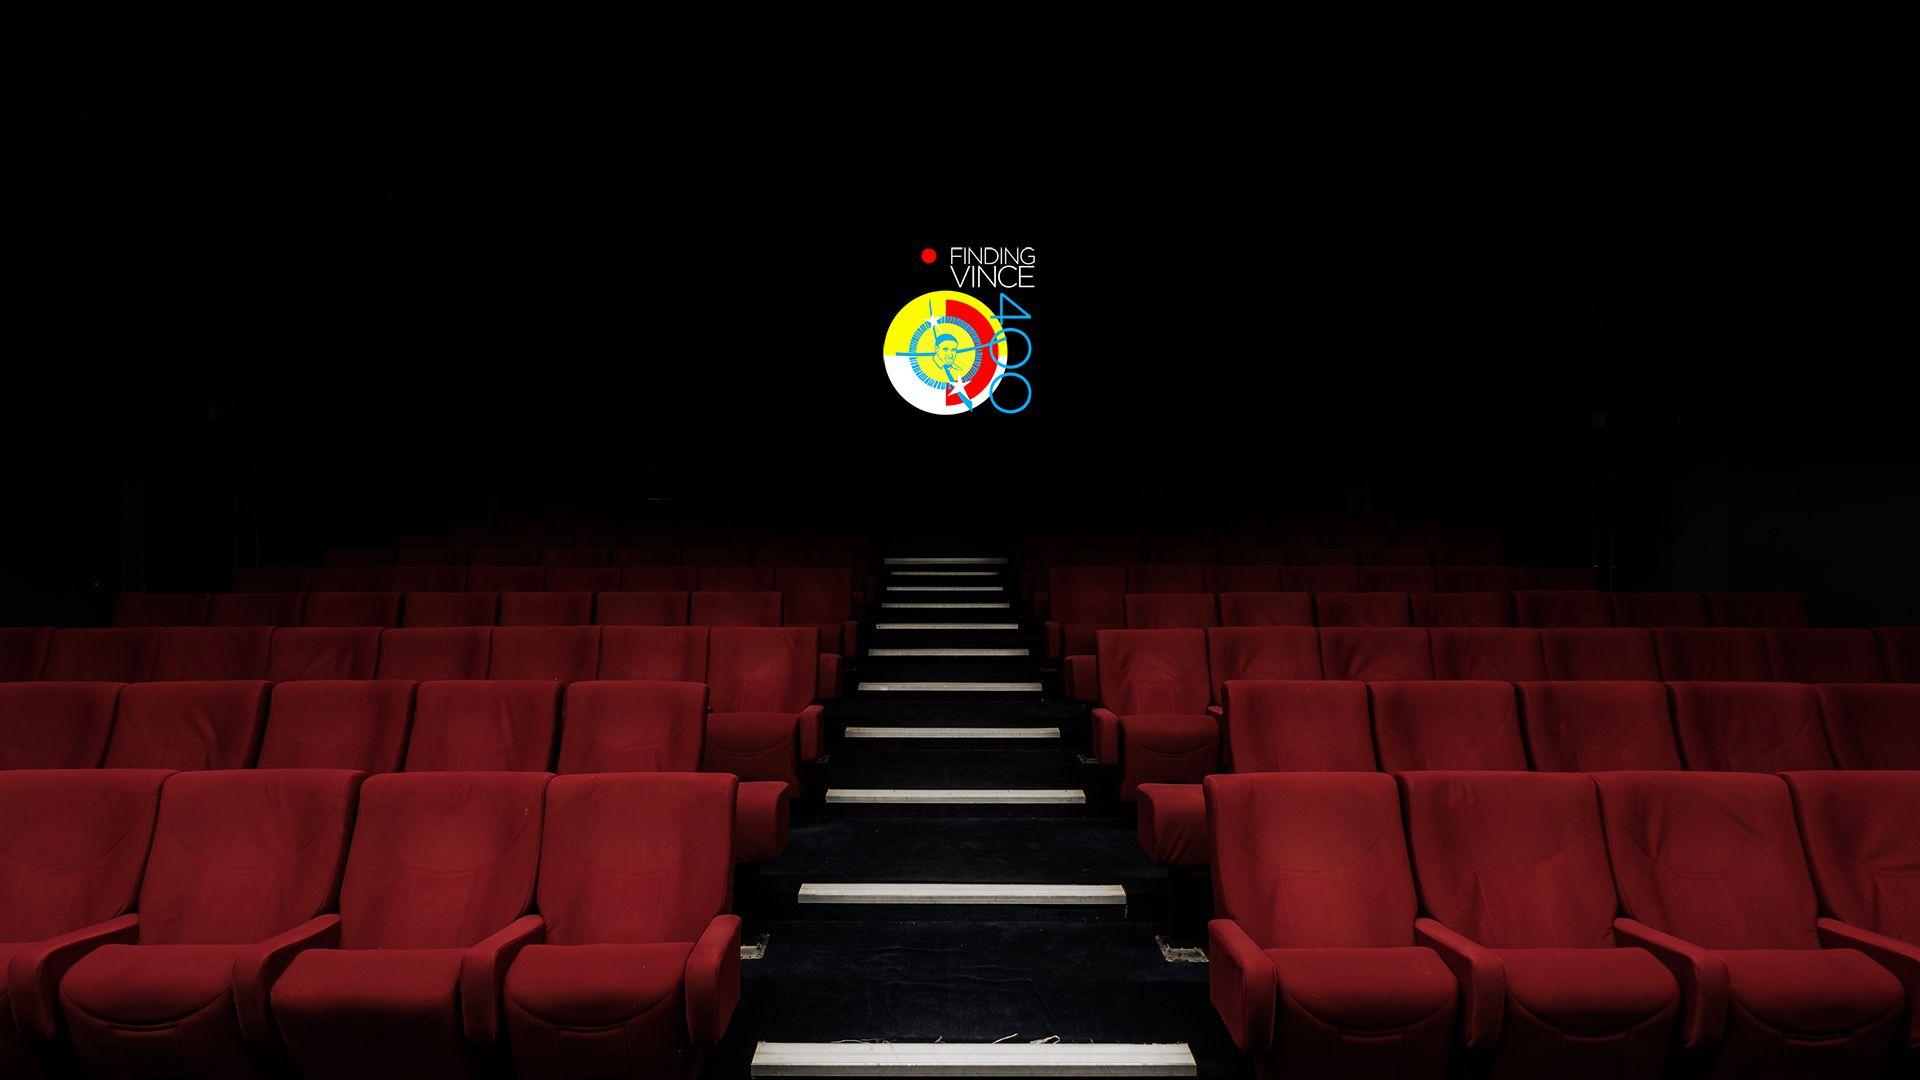 Movie Theater computer Wallpaper